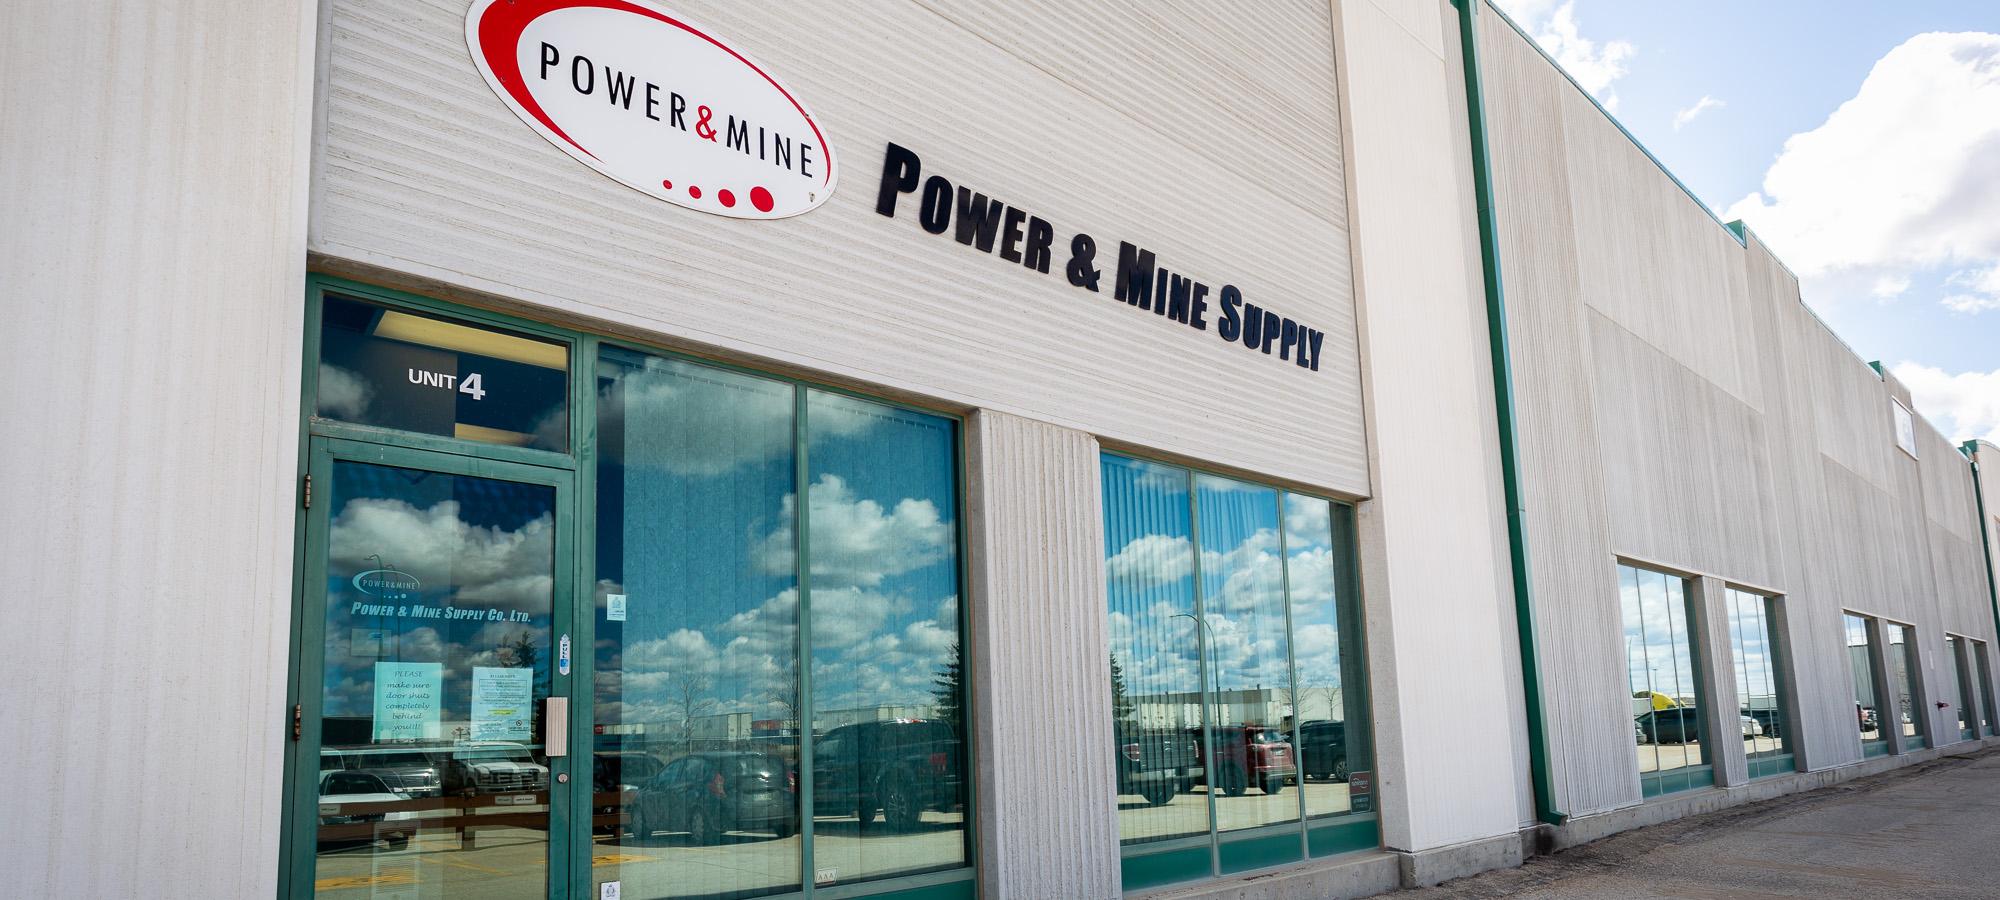 Power & Mine